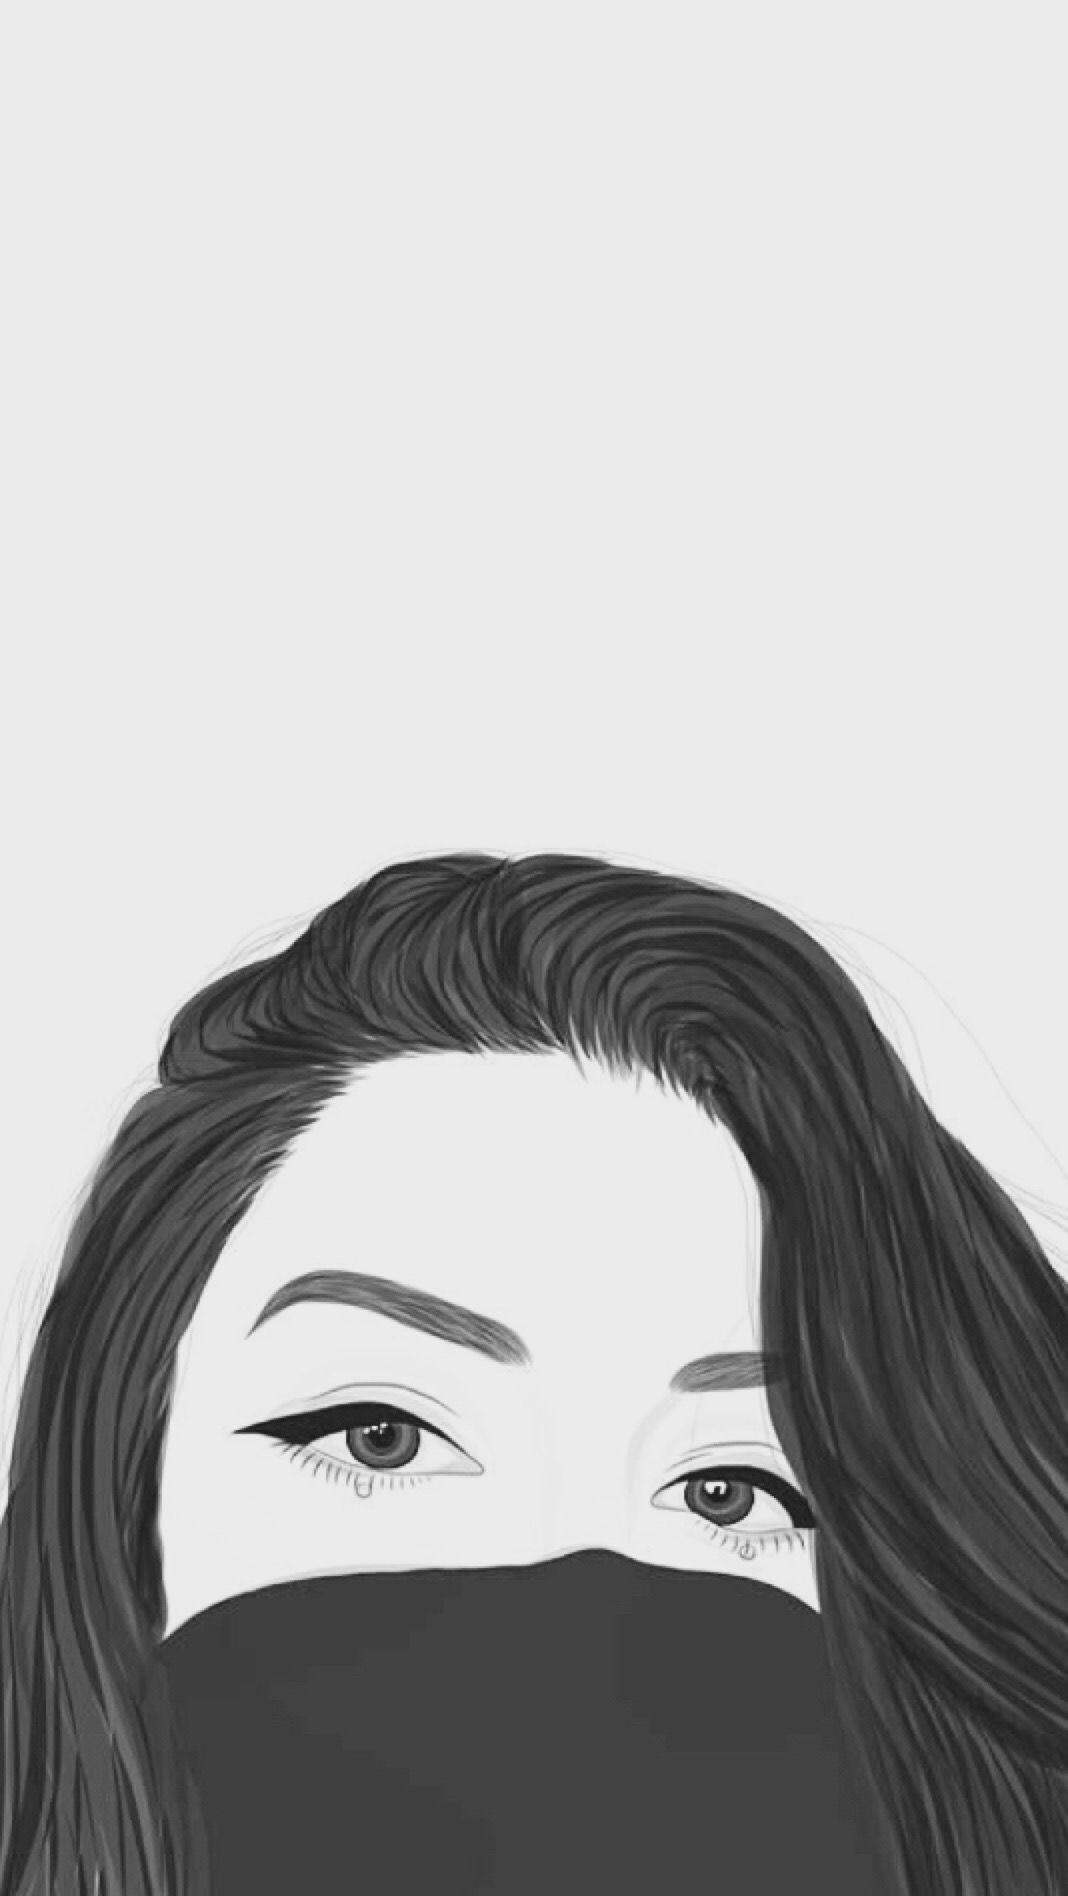 Aesthetic Wallpaper Aesthetic Person Egirl Wallpaper 3d Wallpapers In 2020 Eyes Wallpaper Girl Iphone Wallpaper Drawing Wallpaper